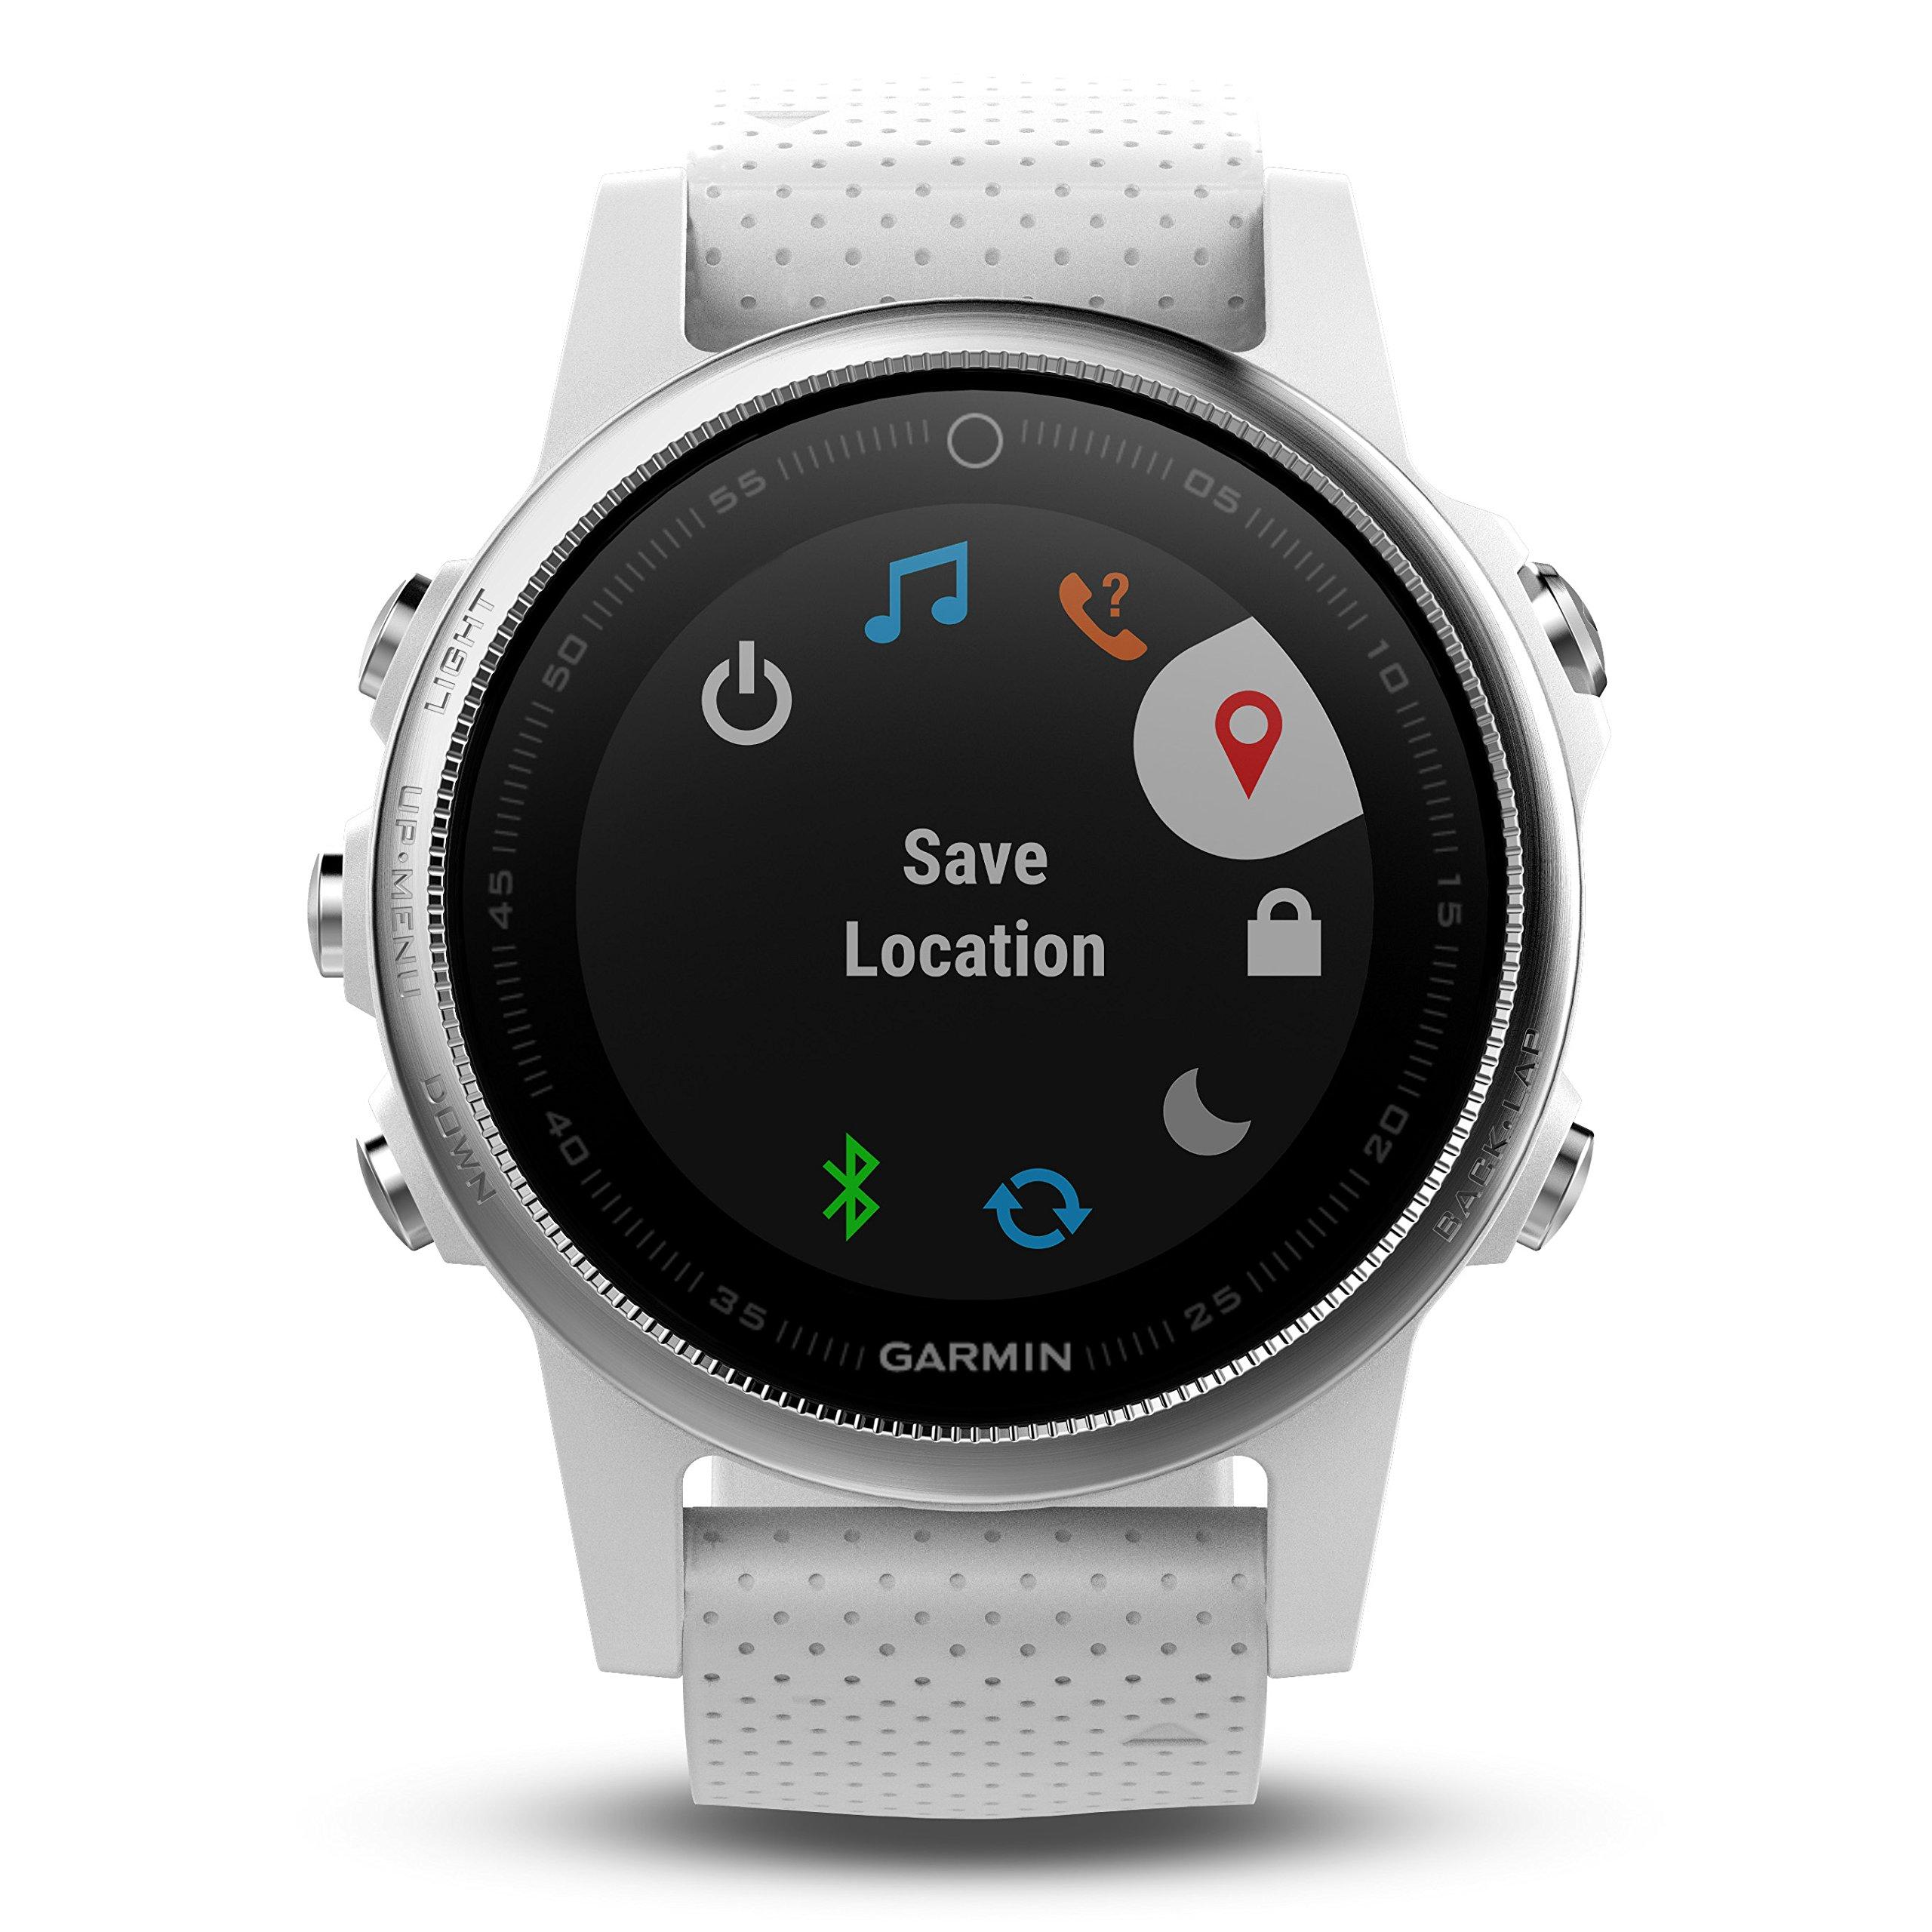 Garmin Fenix 5S Premium GPS Multisport Watch Ultimate Power Bundle   Includes Garmin Fenix 5S Watch (42mm), Wearable4U Power Bank, and Wearable4U Car and Wall USB Charging Adapters   by Wearable4U (Image #2)